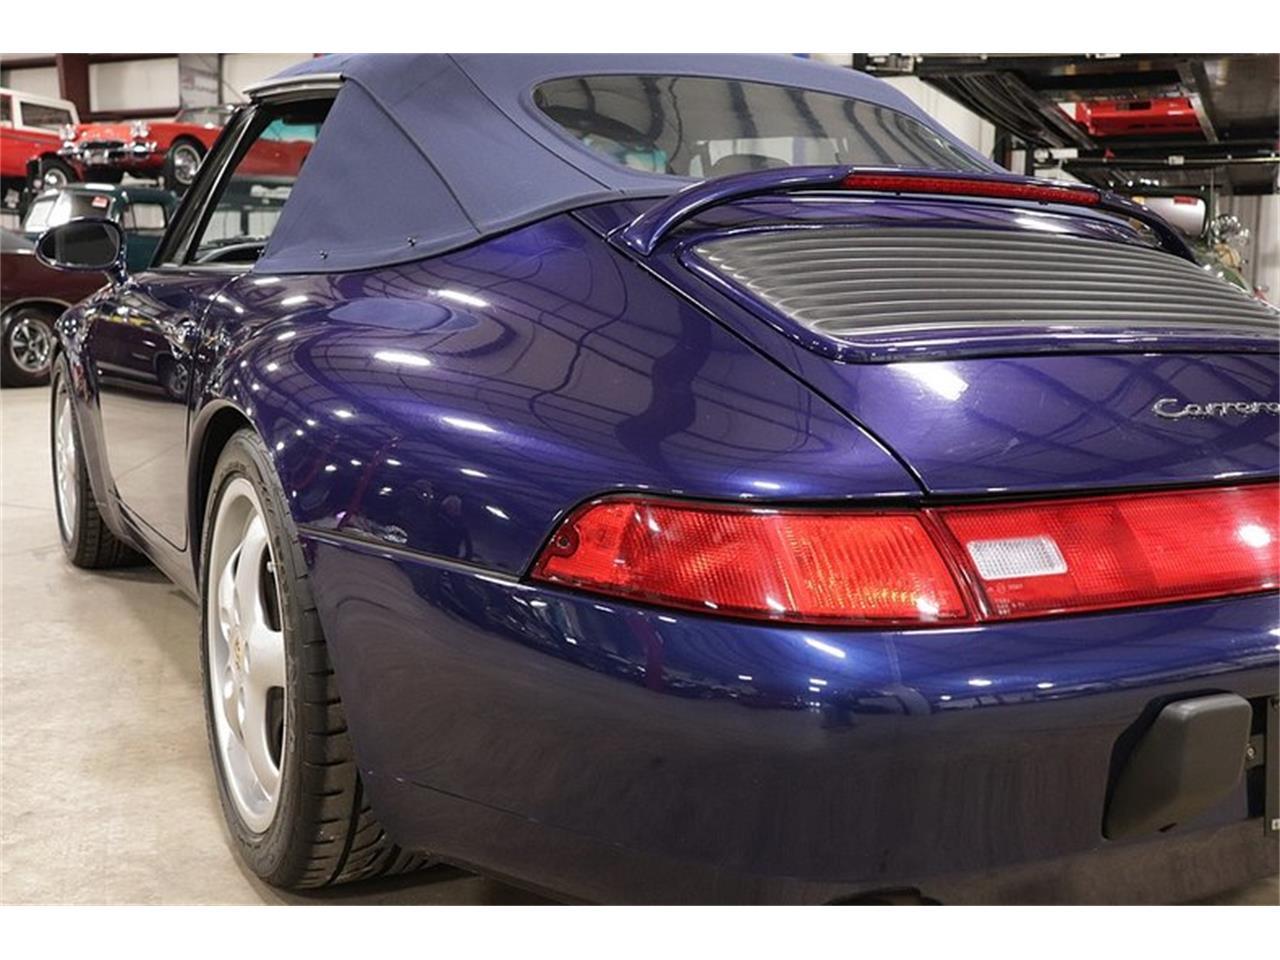 Large Picture of 1996 Porsche 911 located in Michigan - $45,900.00 - OFOC